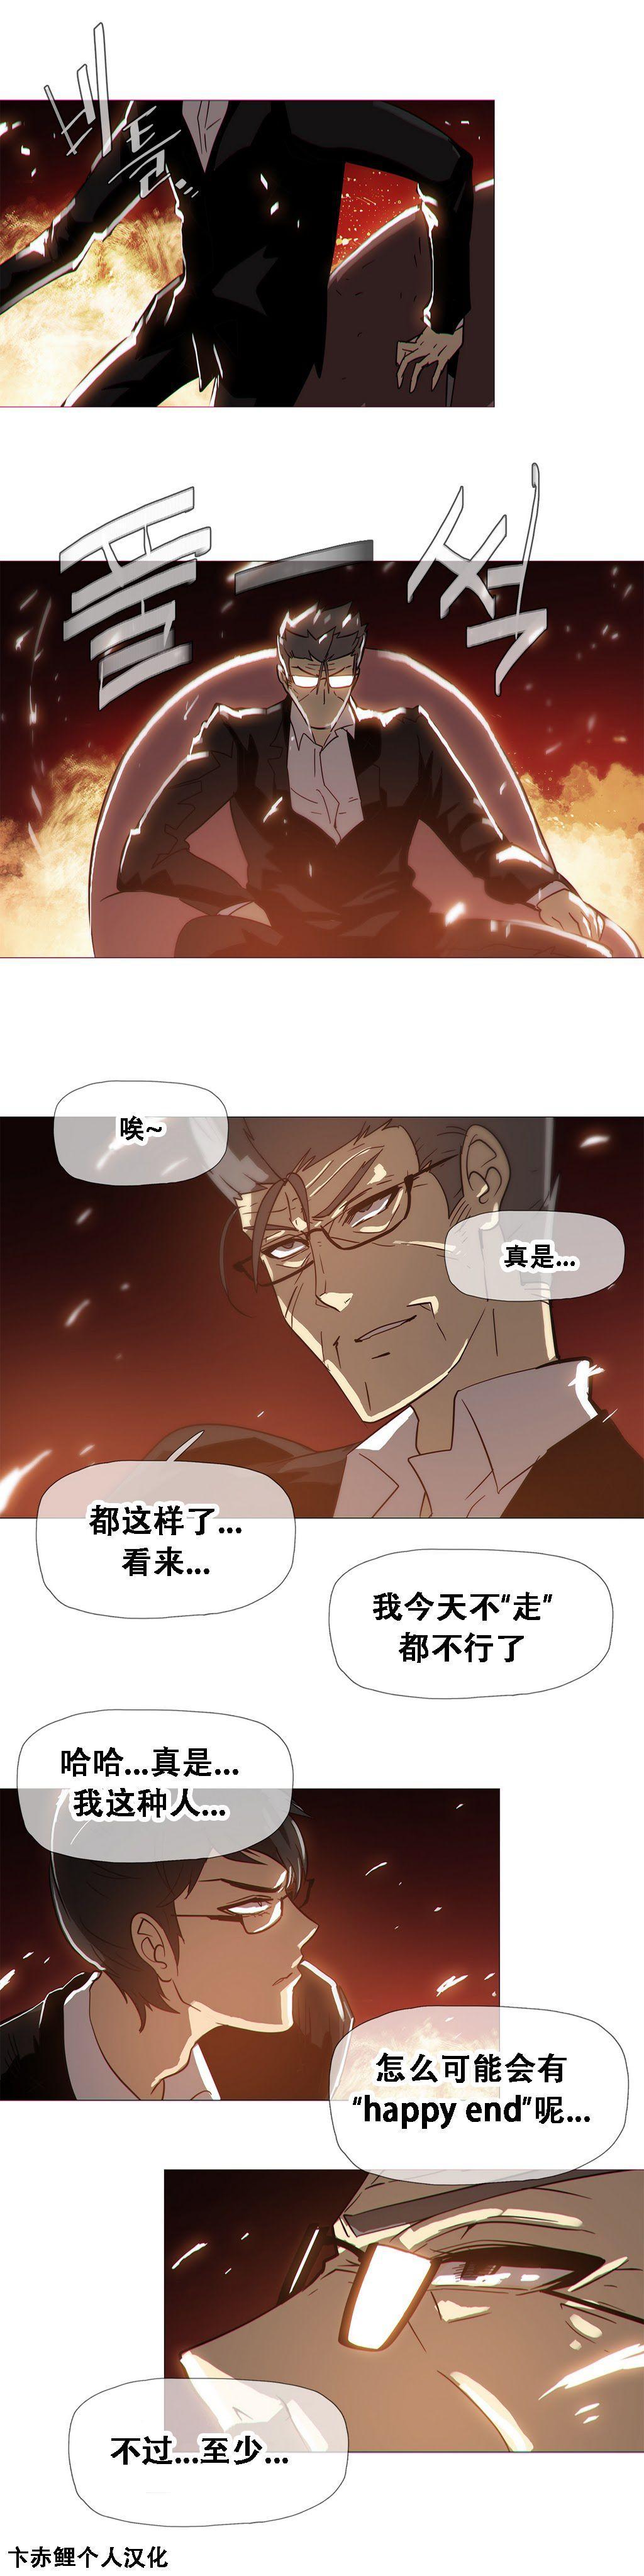 HouseHold Affairs 【卞赤鲤个人汉化】1~33话(持续更新中) 397